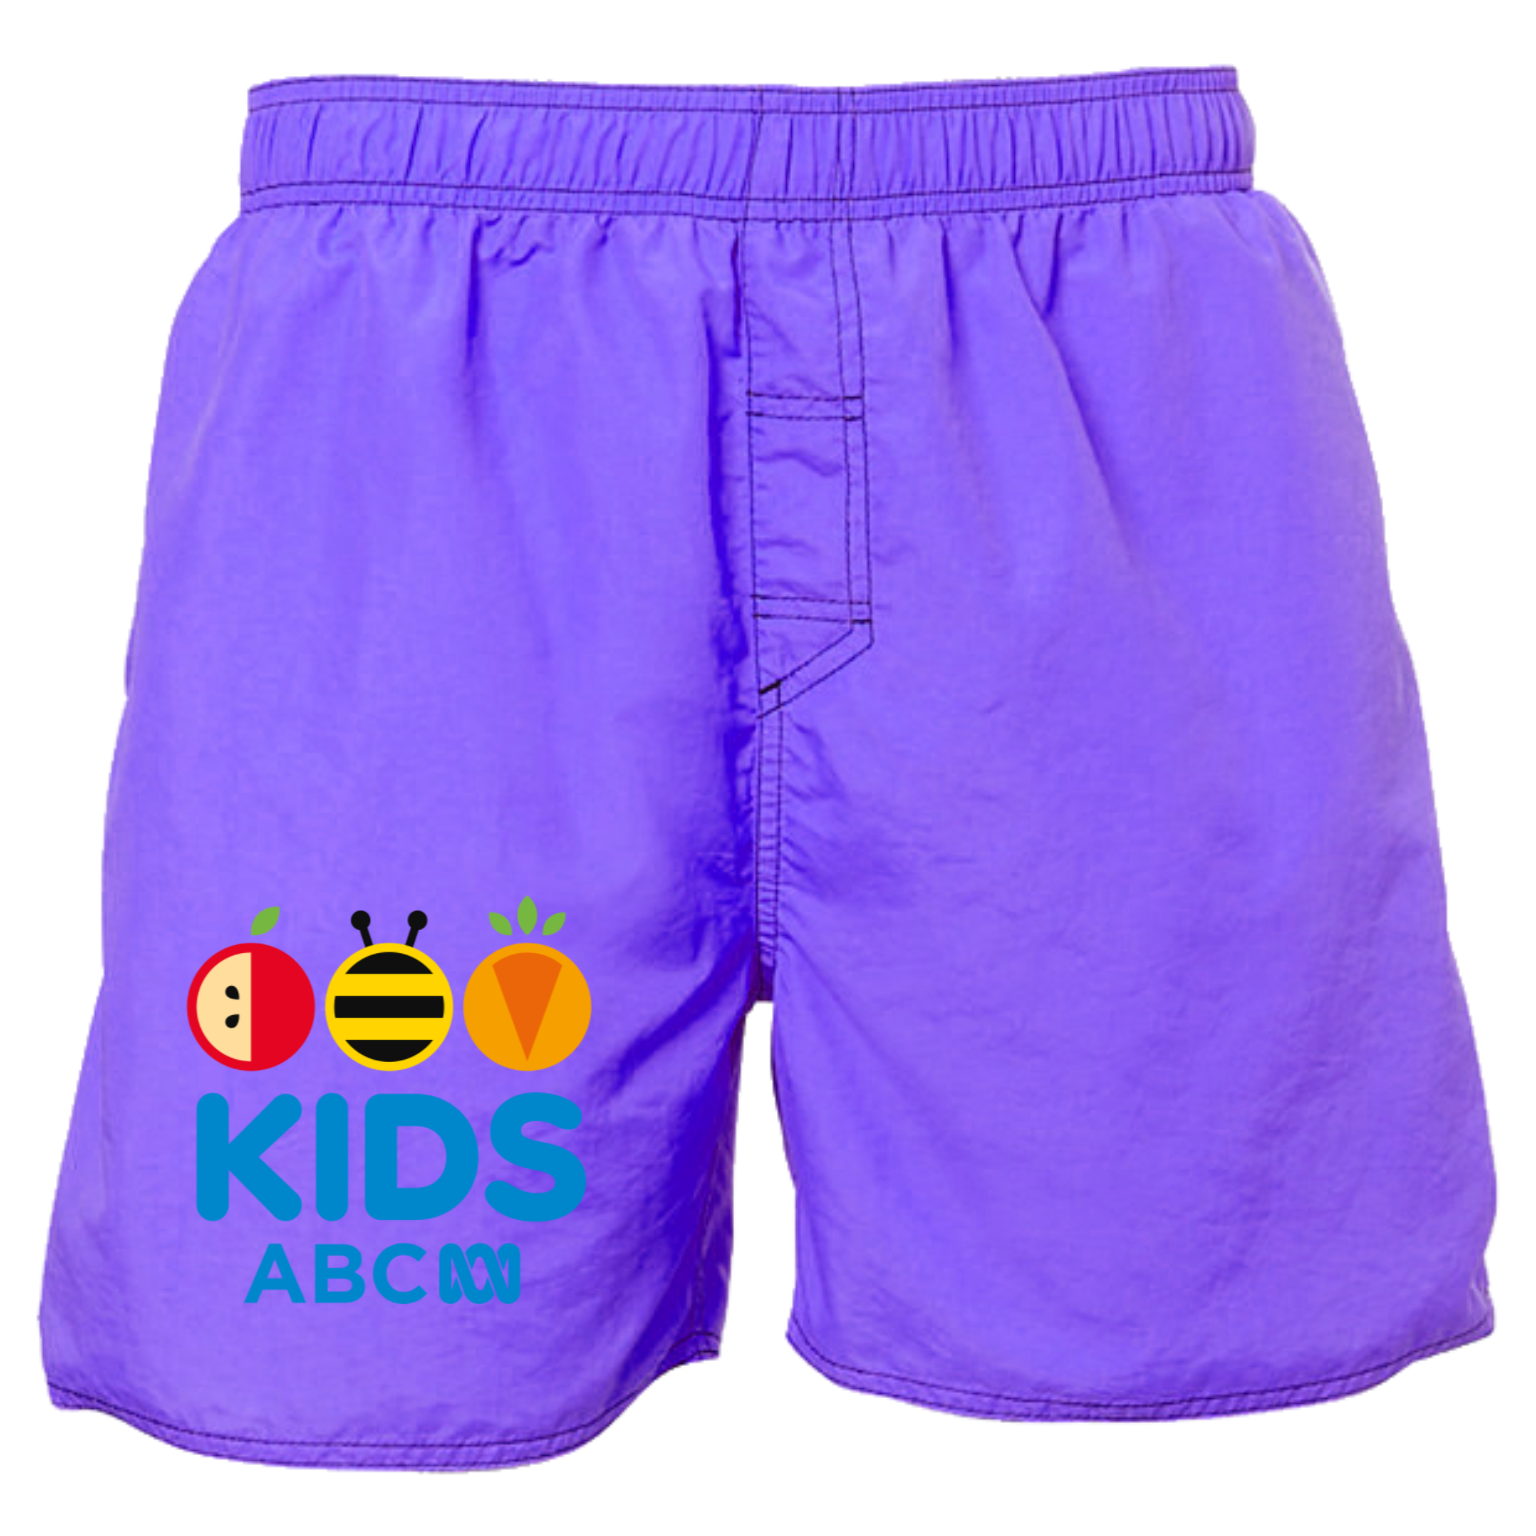 ABC Kids Men's Swim Shorts Purple Size M.png